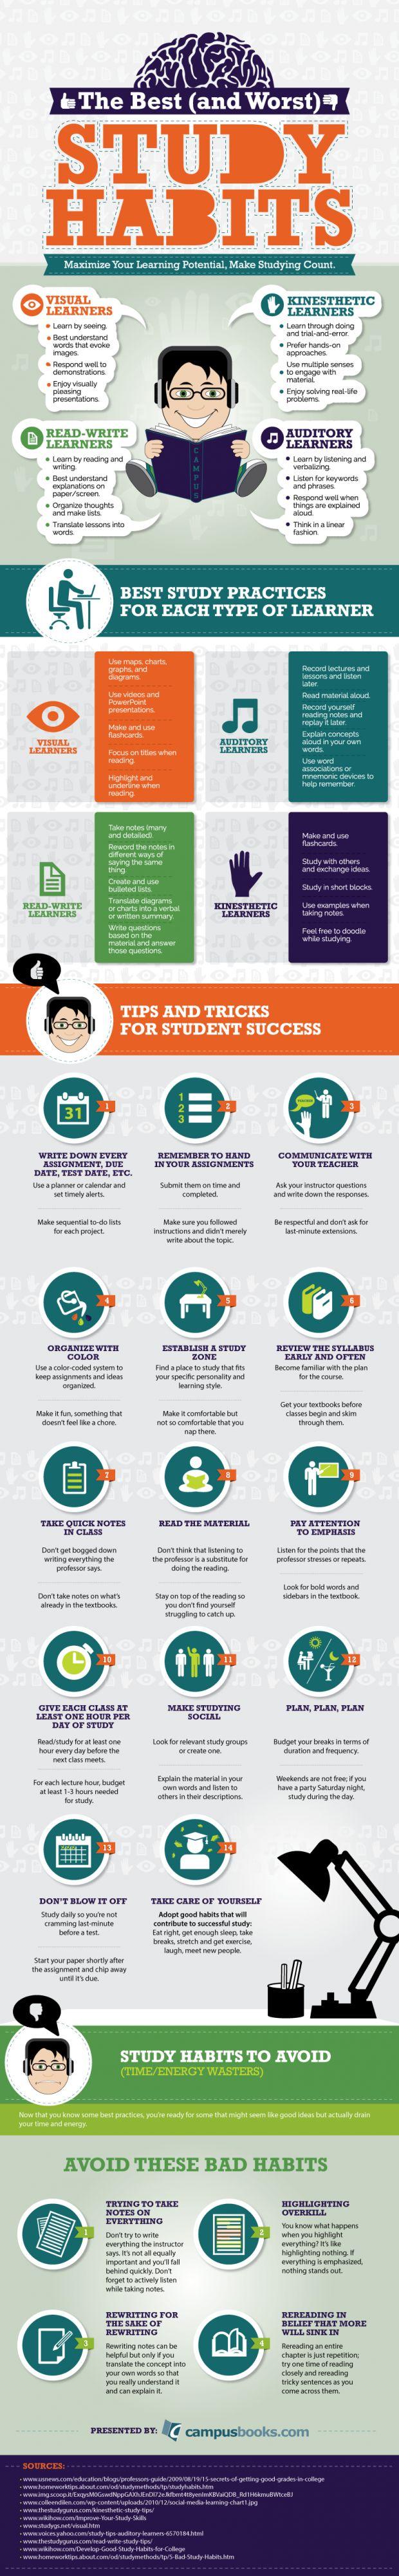 10 Best Study Habits of Successful Students | ECPI University